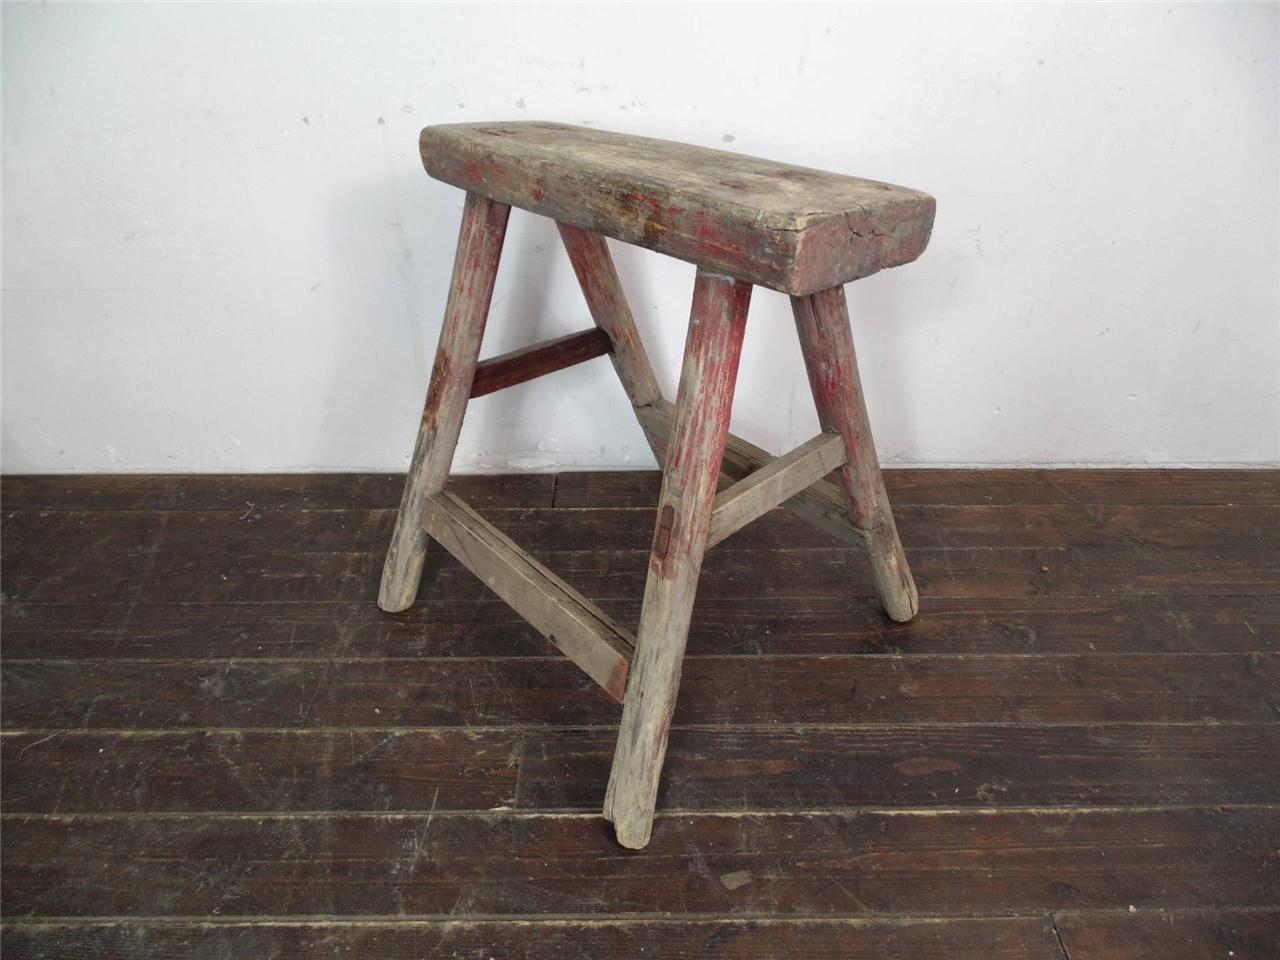 Vintage Rustikal Antik Holz Hocker Melken Extra L Nicht L123 | EBay